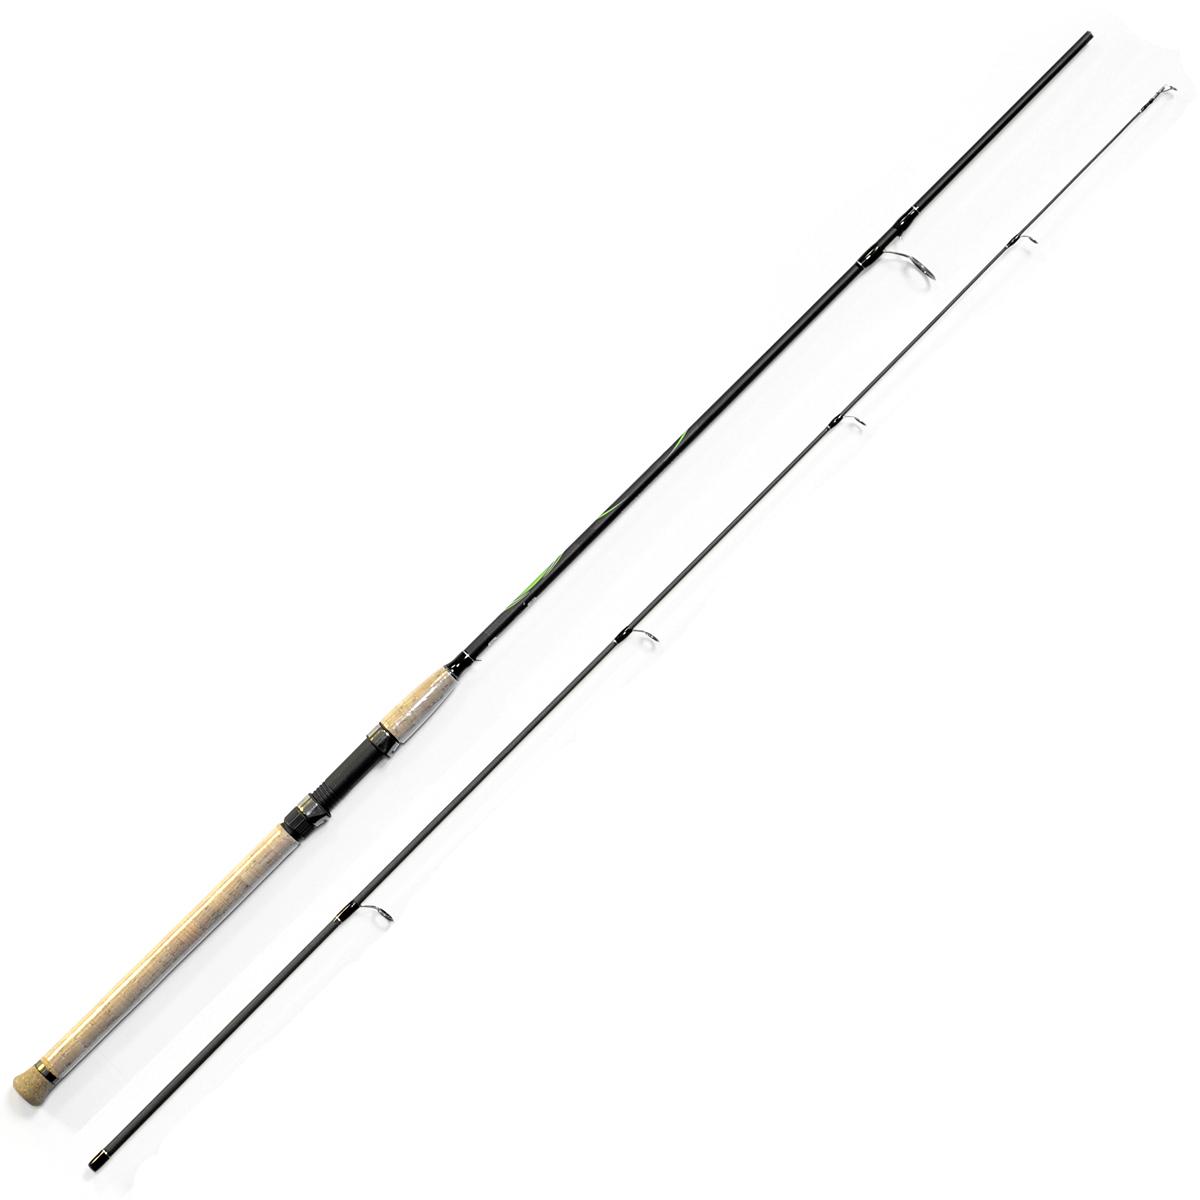 Спиннинг Salmo Sniper, 2,7 м, 5-20 г спиннинг штекерный salmo taifun 40 2 1 м 10 40 г